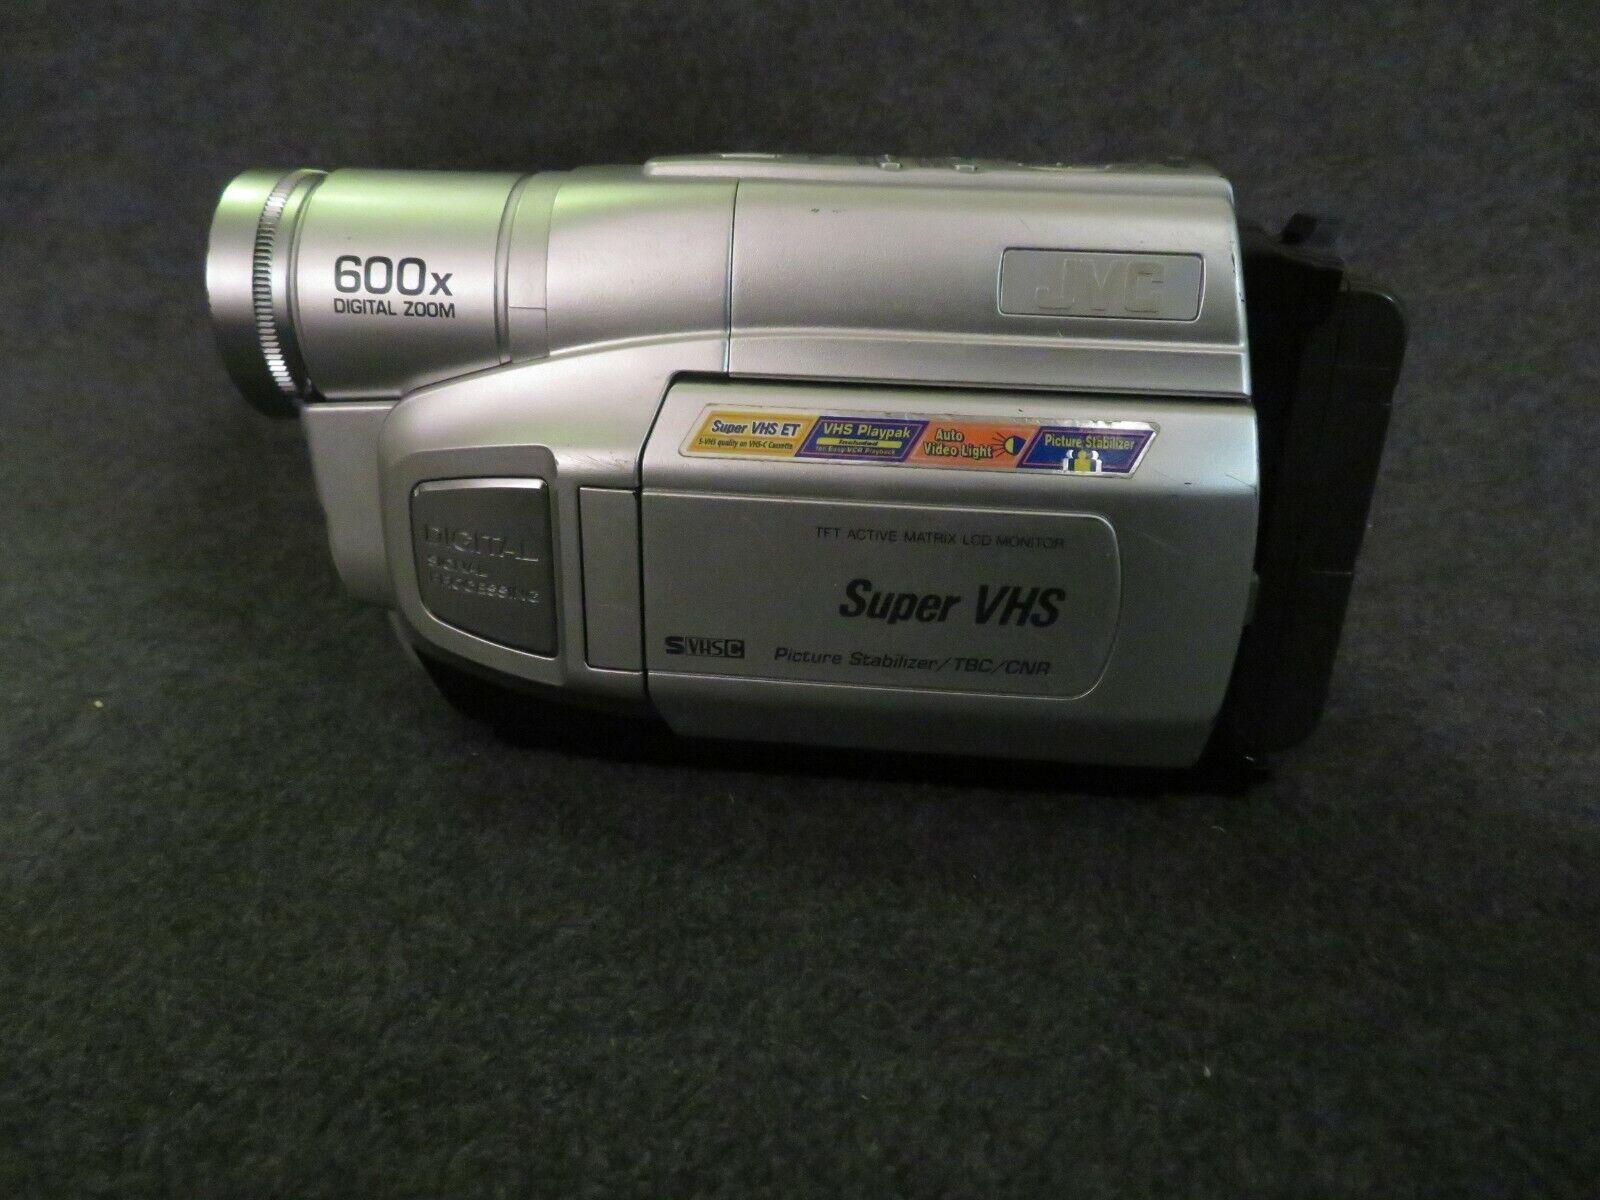 Jvc Gr Sxm250u Svhs Camcorder 600x Zoom Working Very Good For Sale Online Ebay